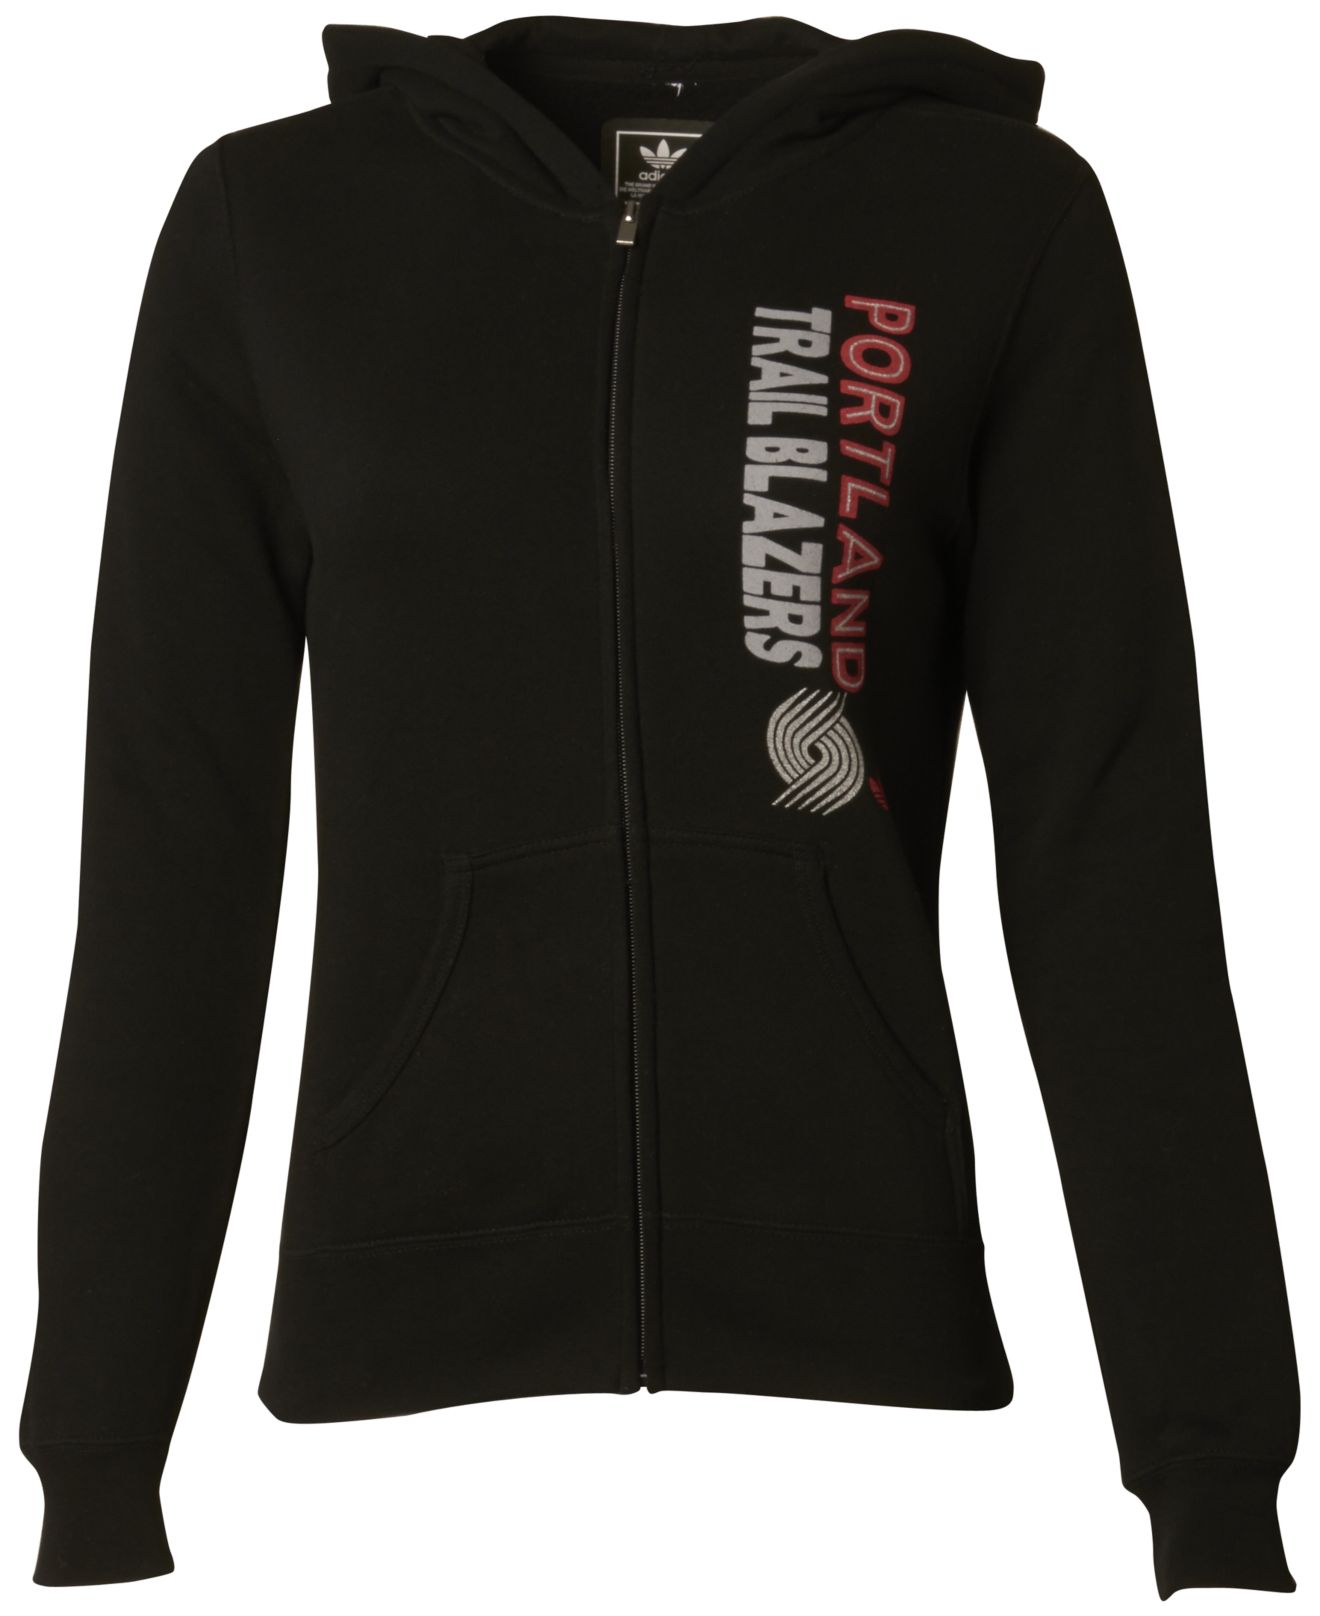 Adidas Women's Portland Trail Blazers Full-zip Hoodie In